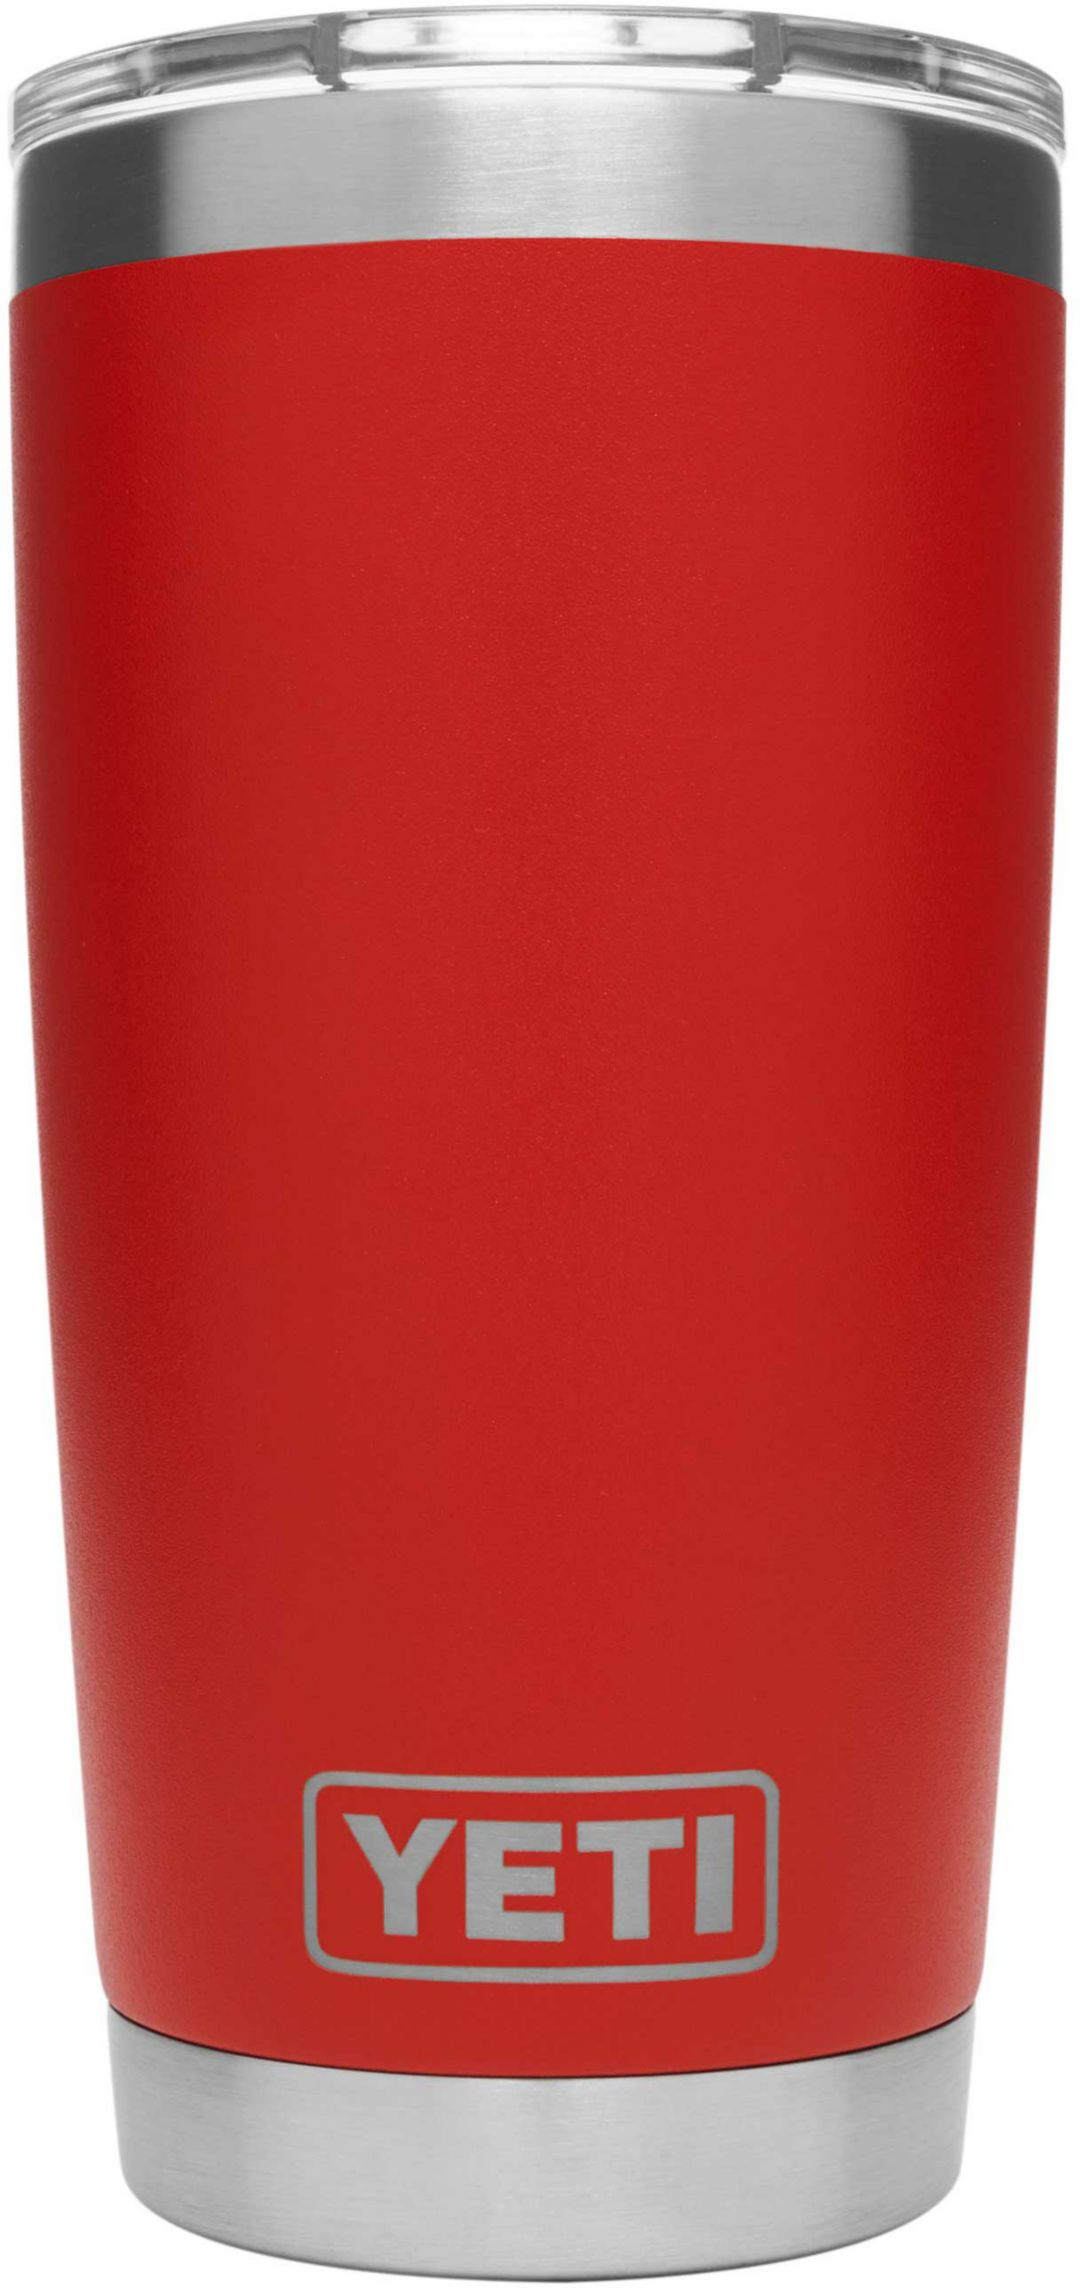 a9bd2463f7f YETI 20 oz. Rambler Tumbler with MagSlider Lid